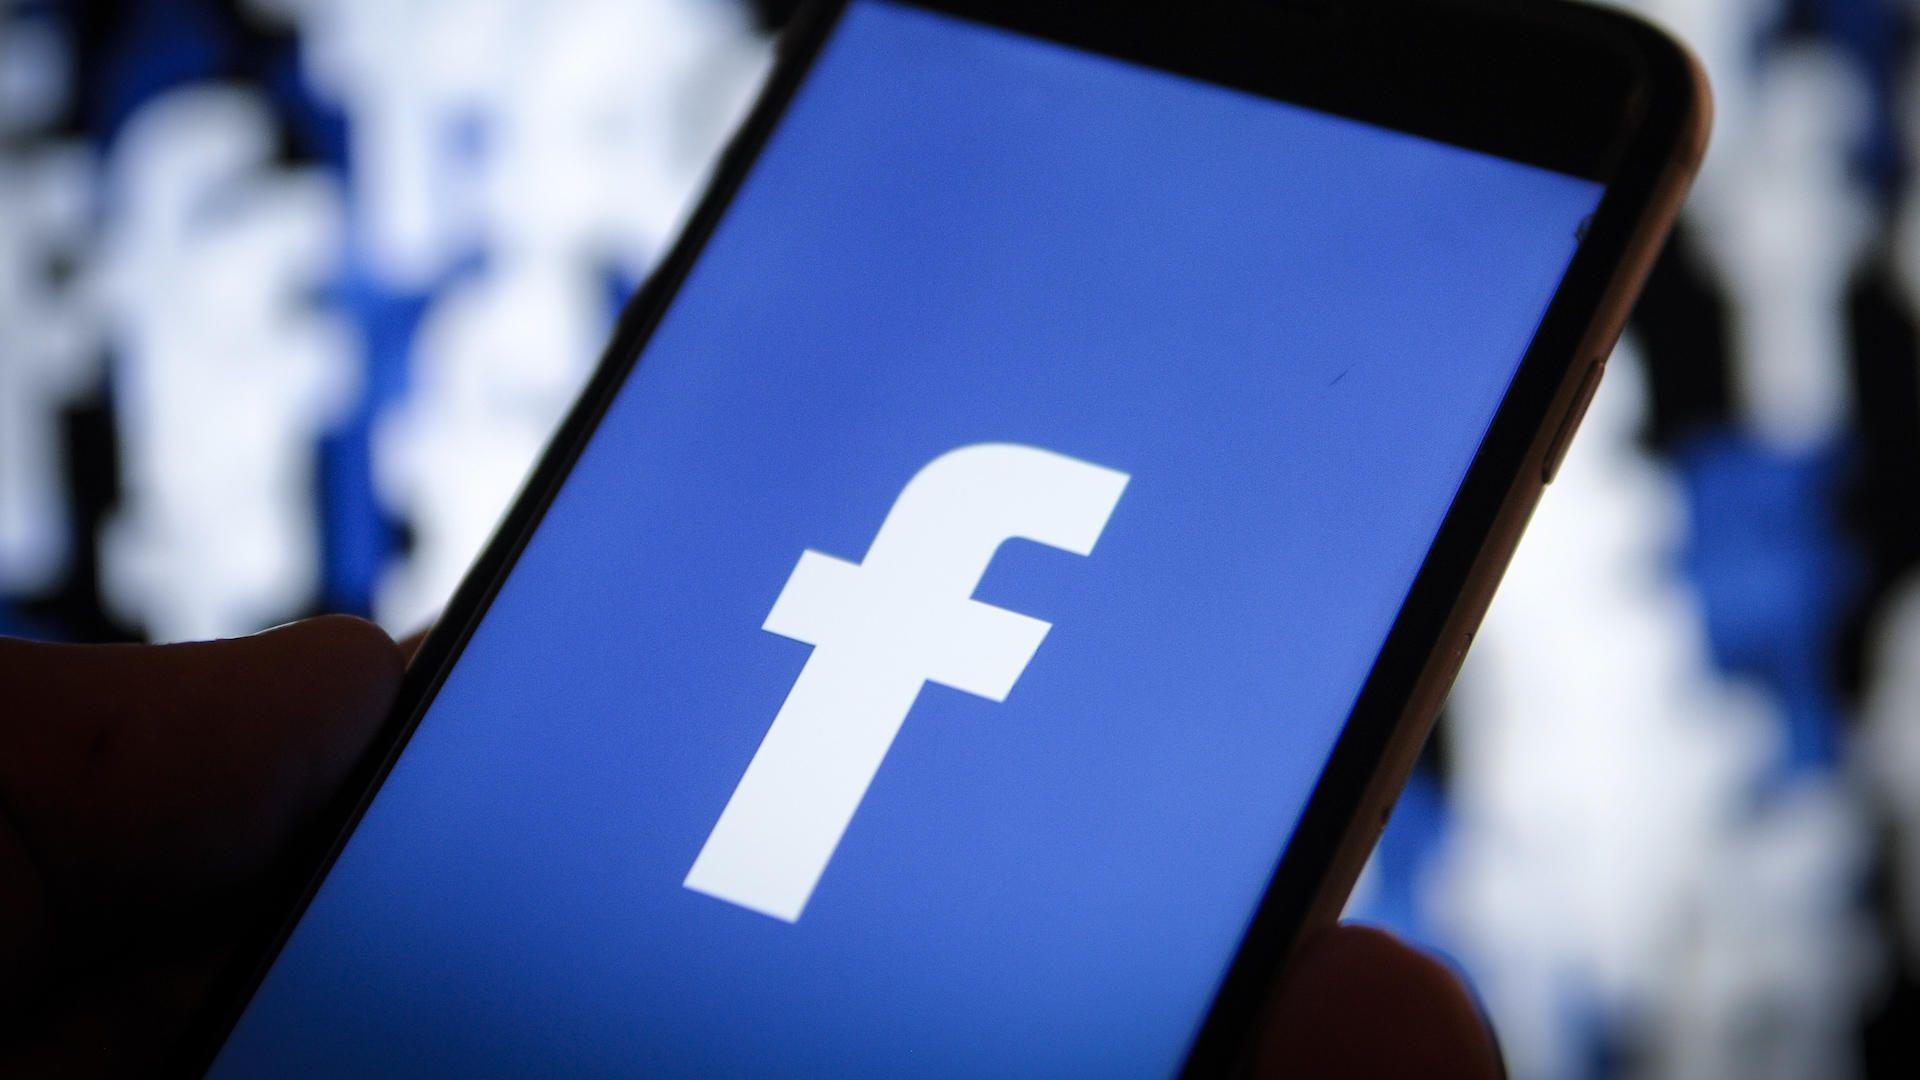 Facebook quiere conectar a los usuarios de Messenger, WhatsApp e Instagram